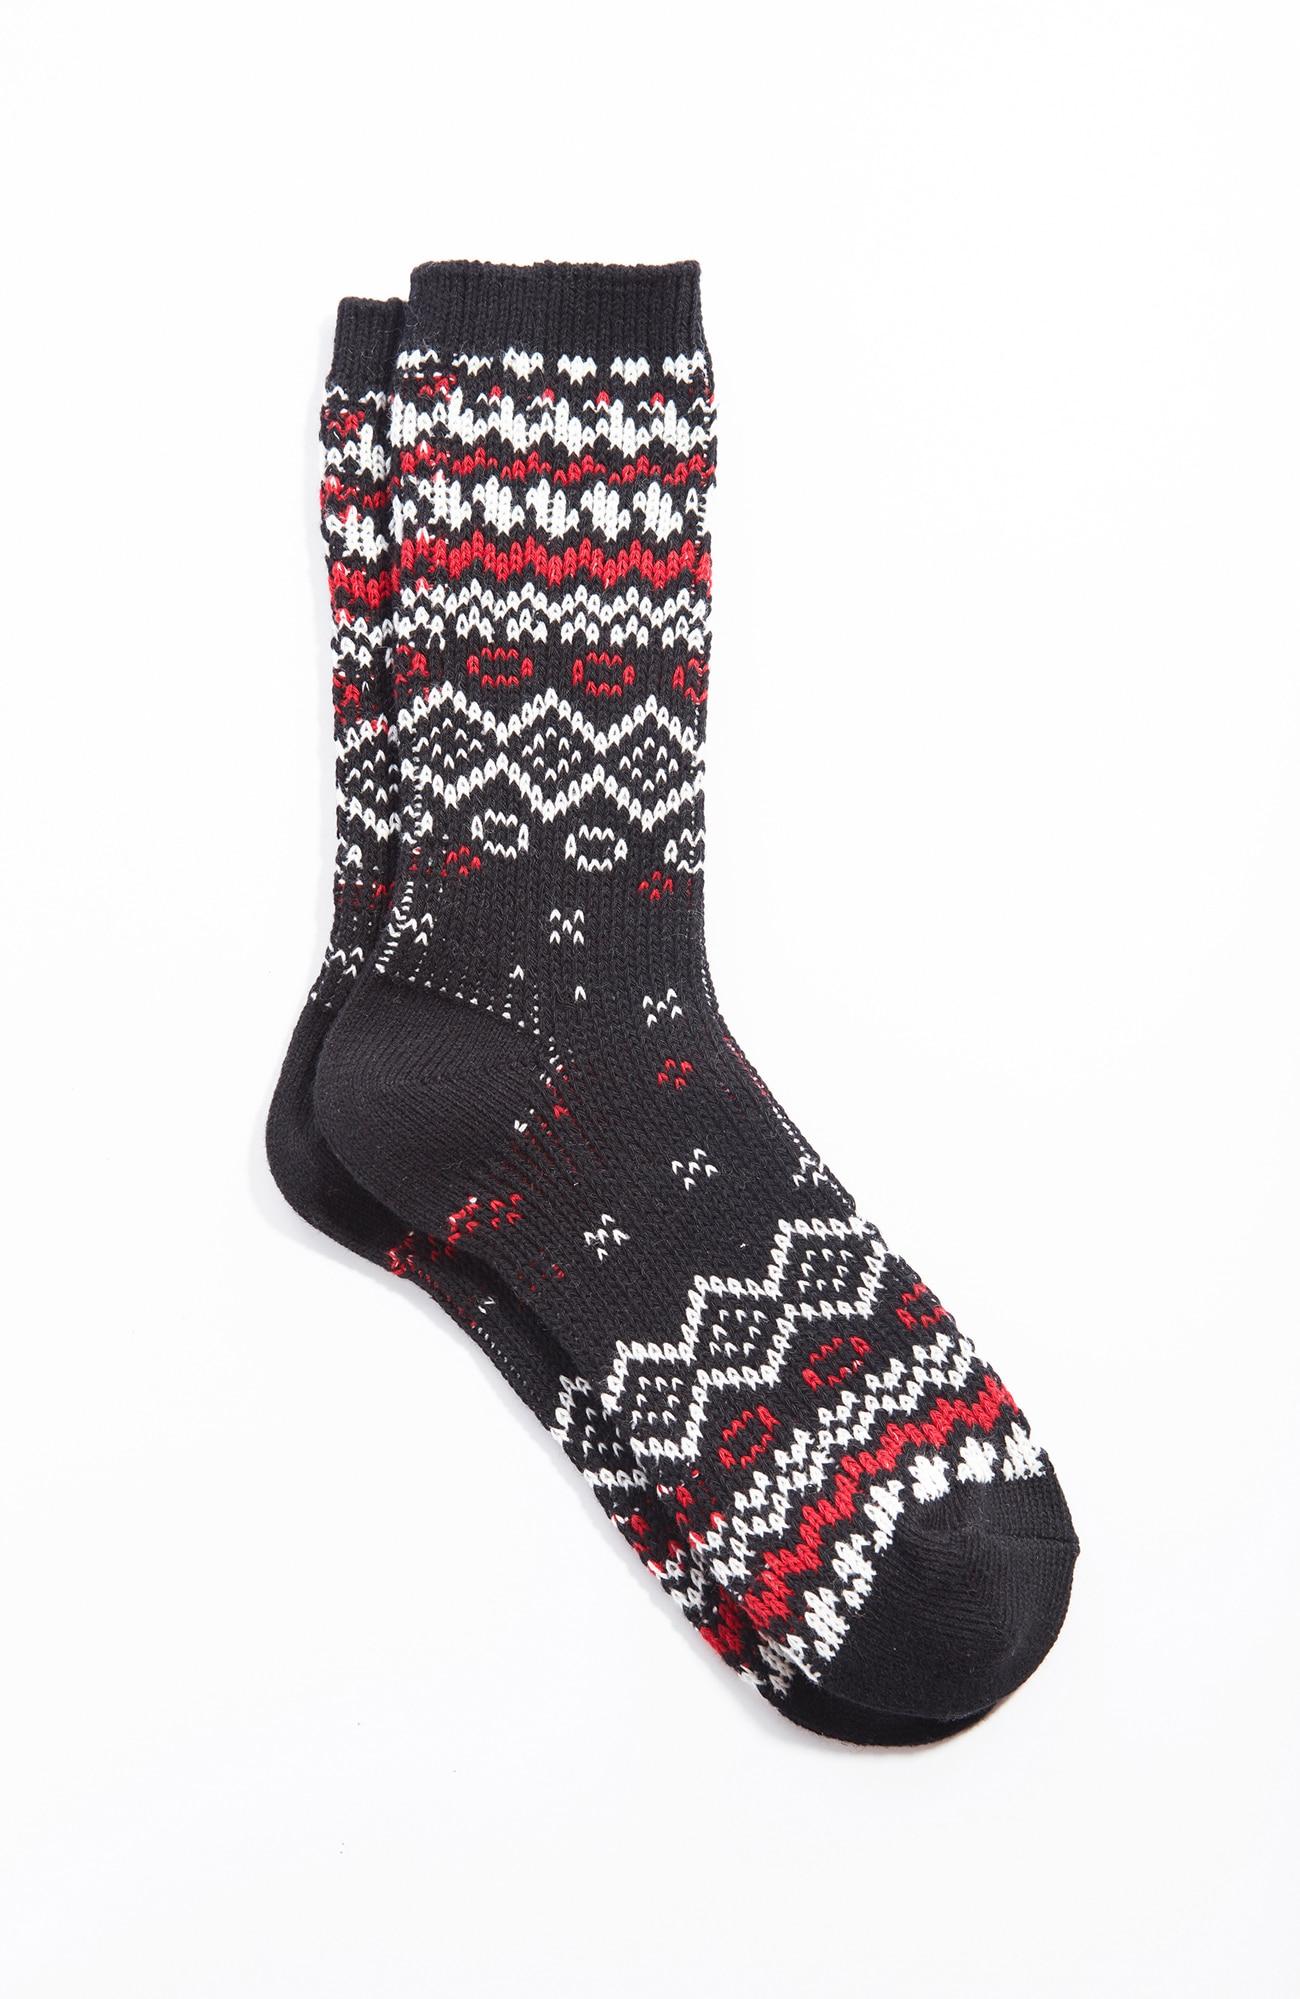 Fair Isle jacquard crew socks